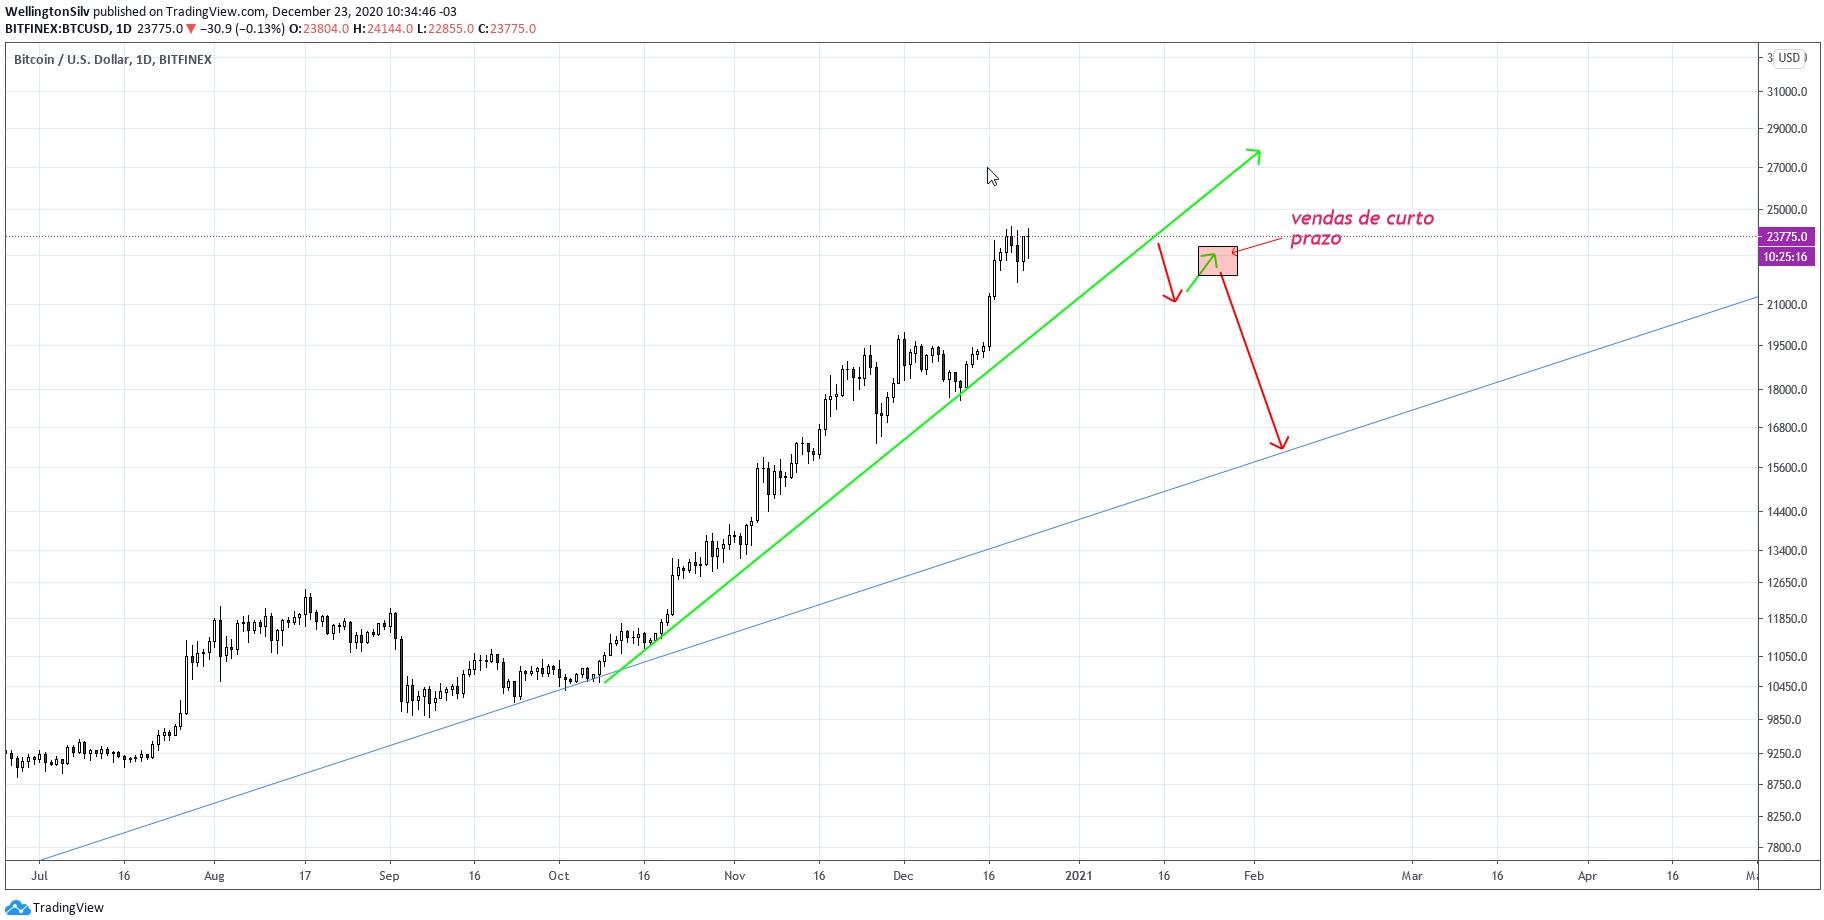 Gráfico diário do Bitcoin (D)